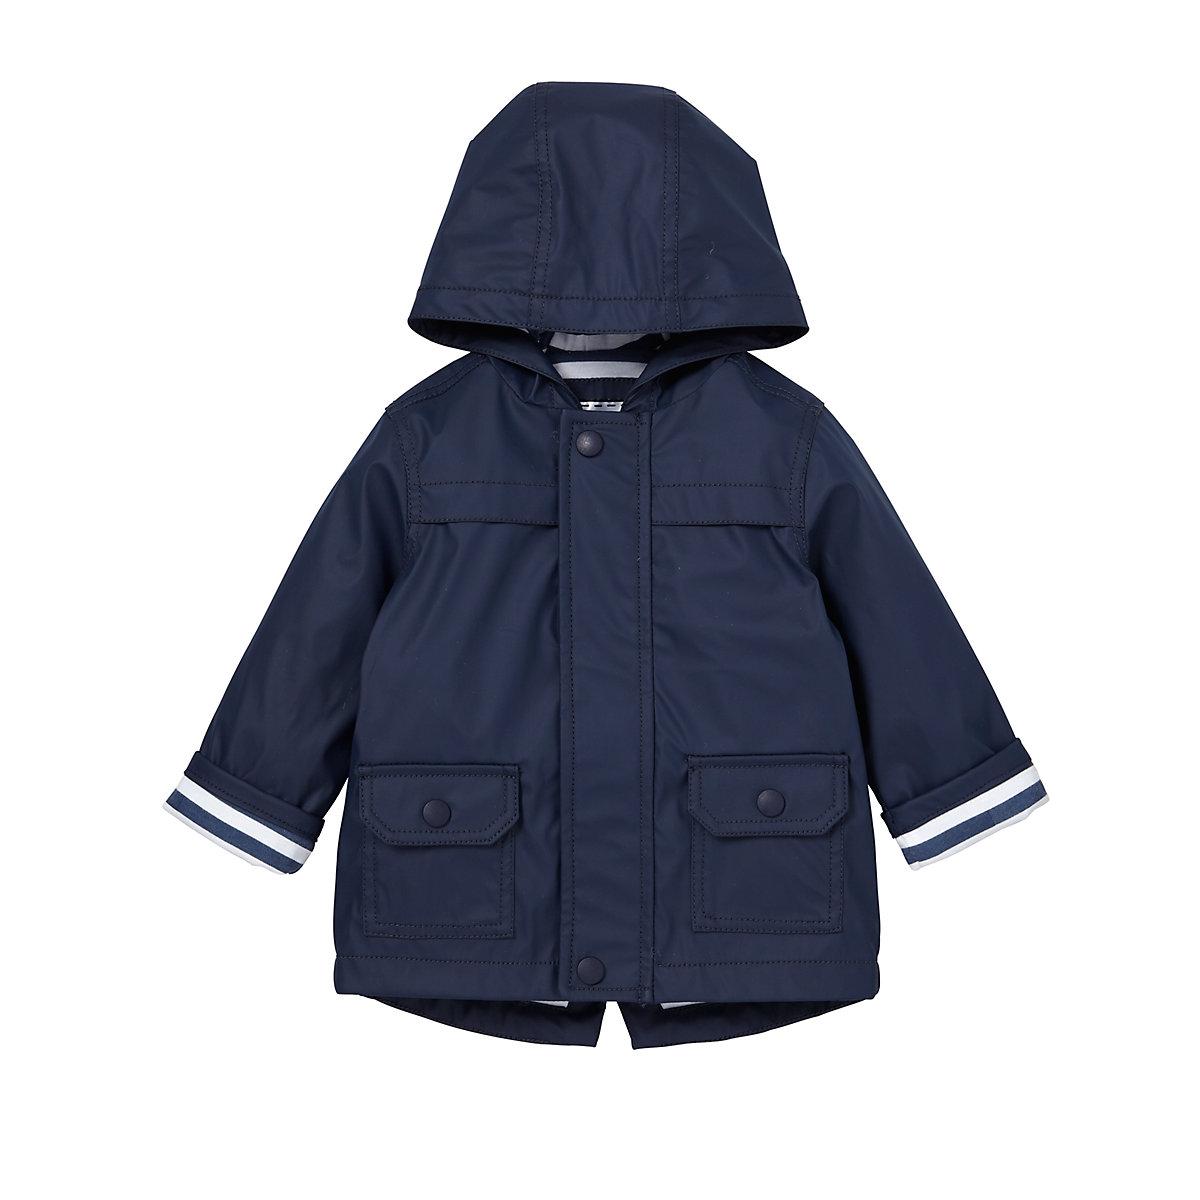 Mothercare PU Jacket - Navy